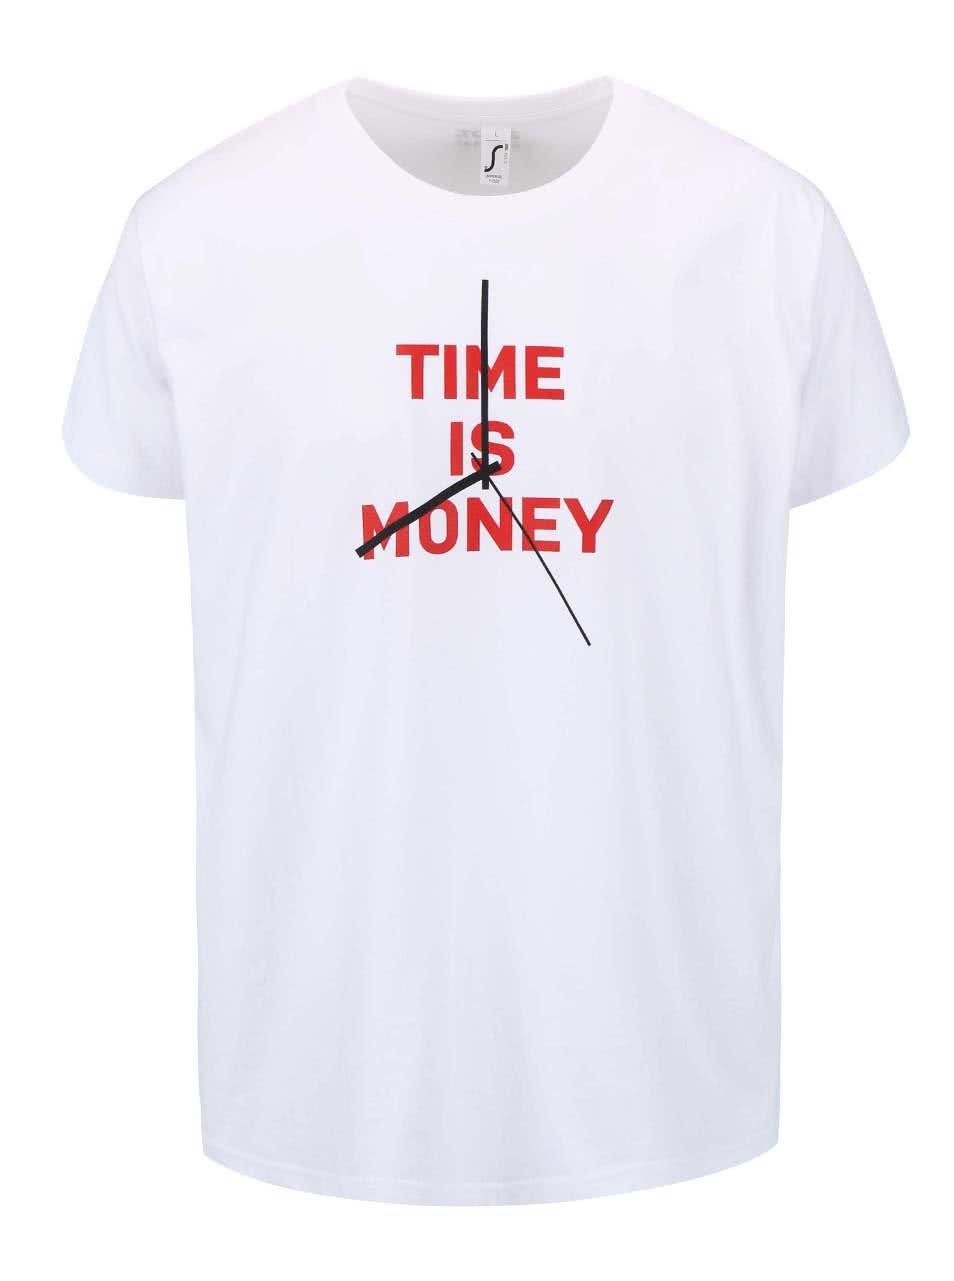 Biele pánske tričko ZOOT Originál Time Is Money ... 4fc87a67925